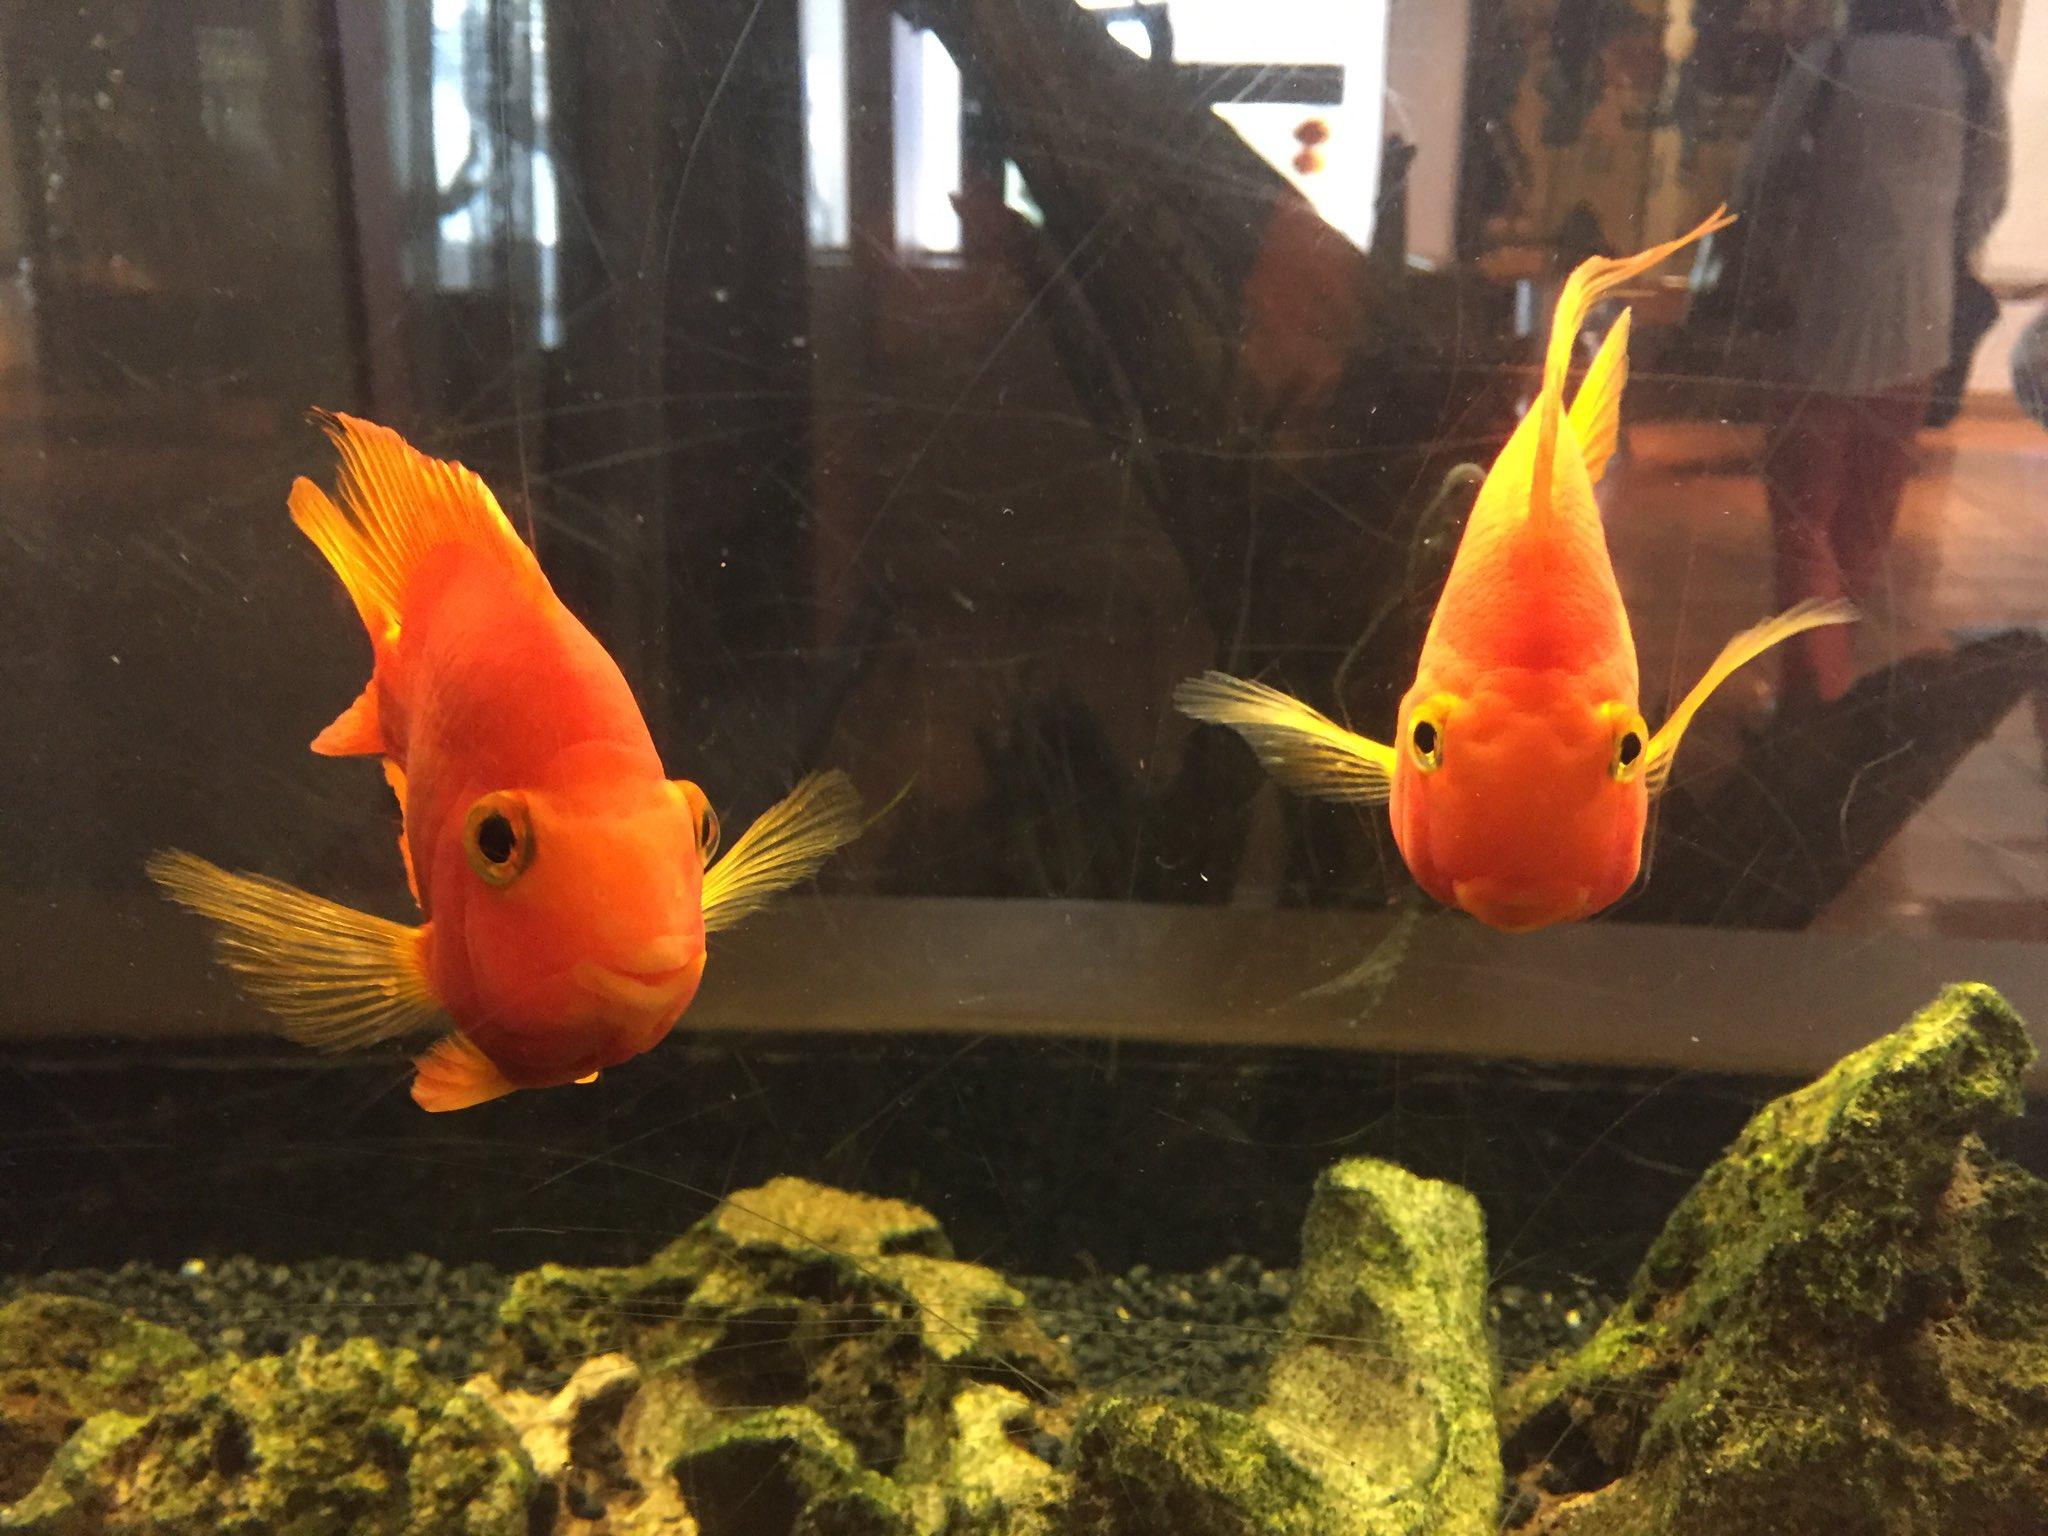 Fish at the @WashPlazaHotel #KSDC17 https://t.co/CyFvNrjzyT